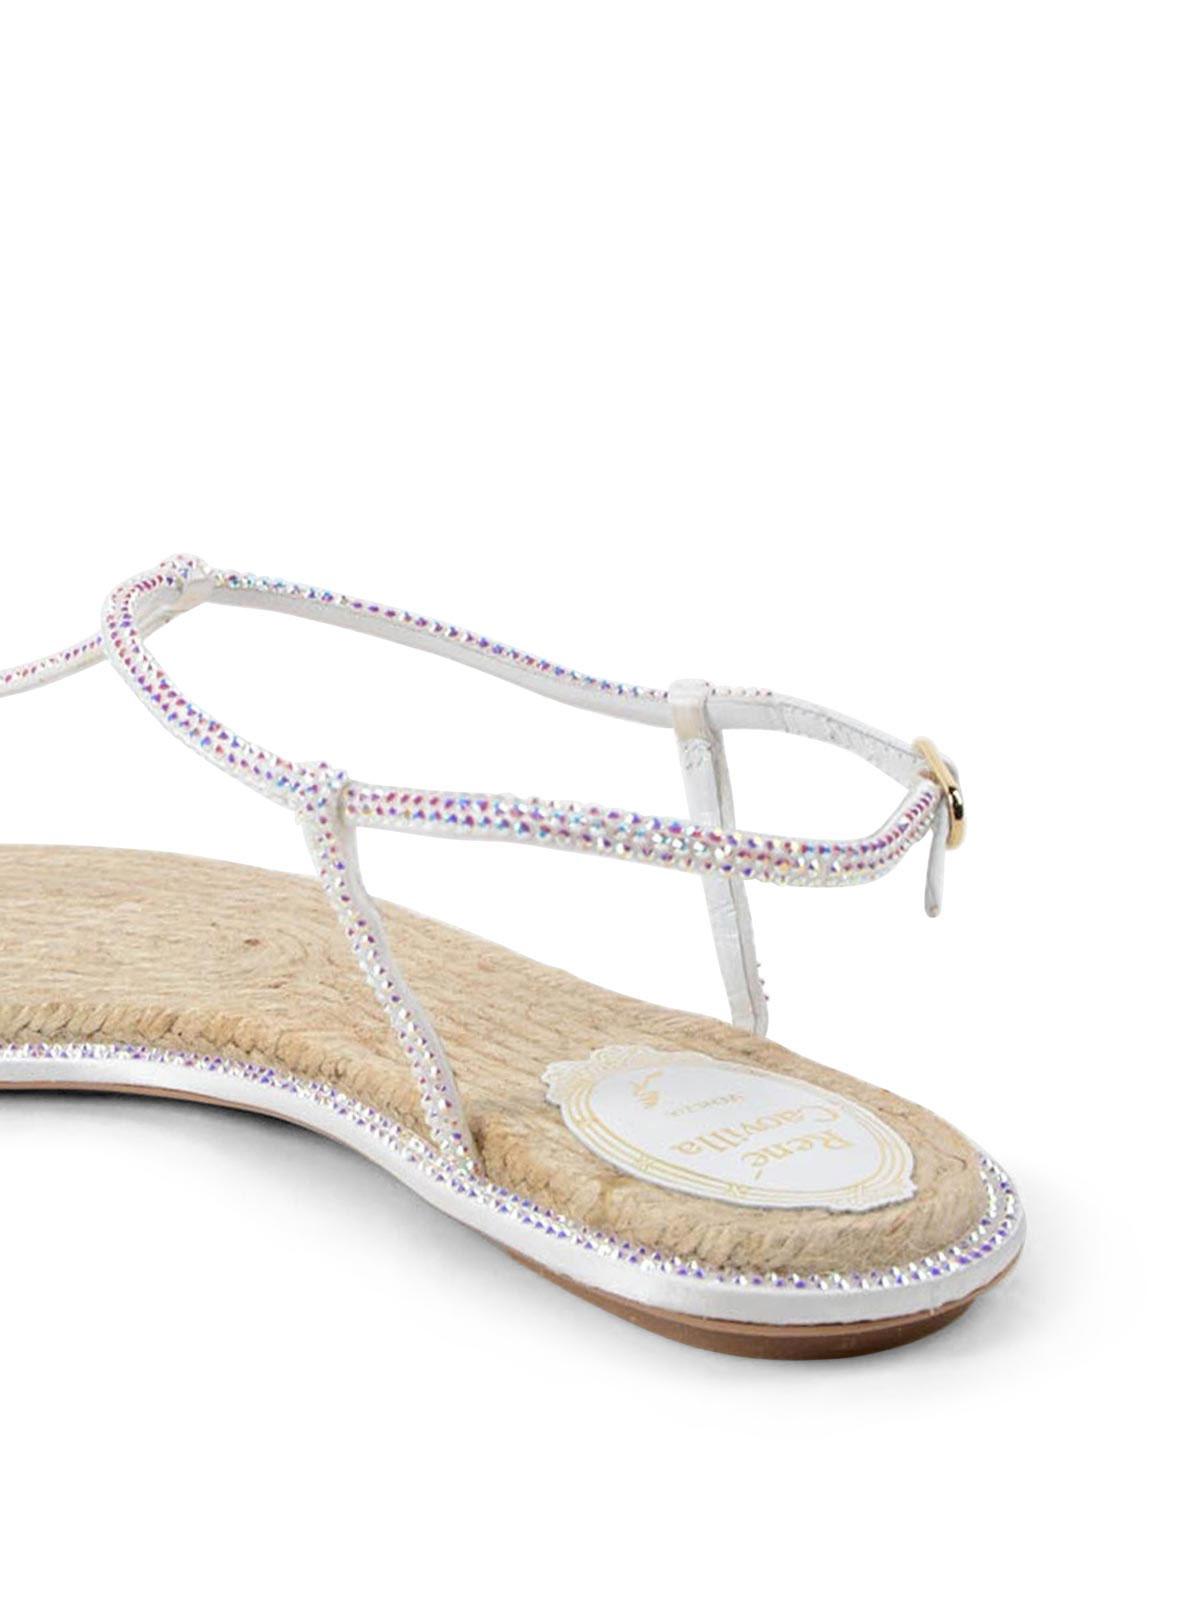 3b458b9800a9 Rene Caovilla - Crystal embellished thong sandals - sandals - C08932 ...